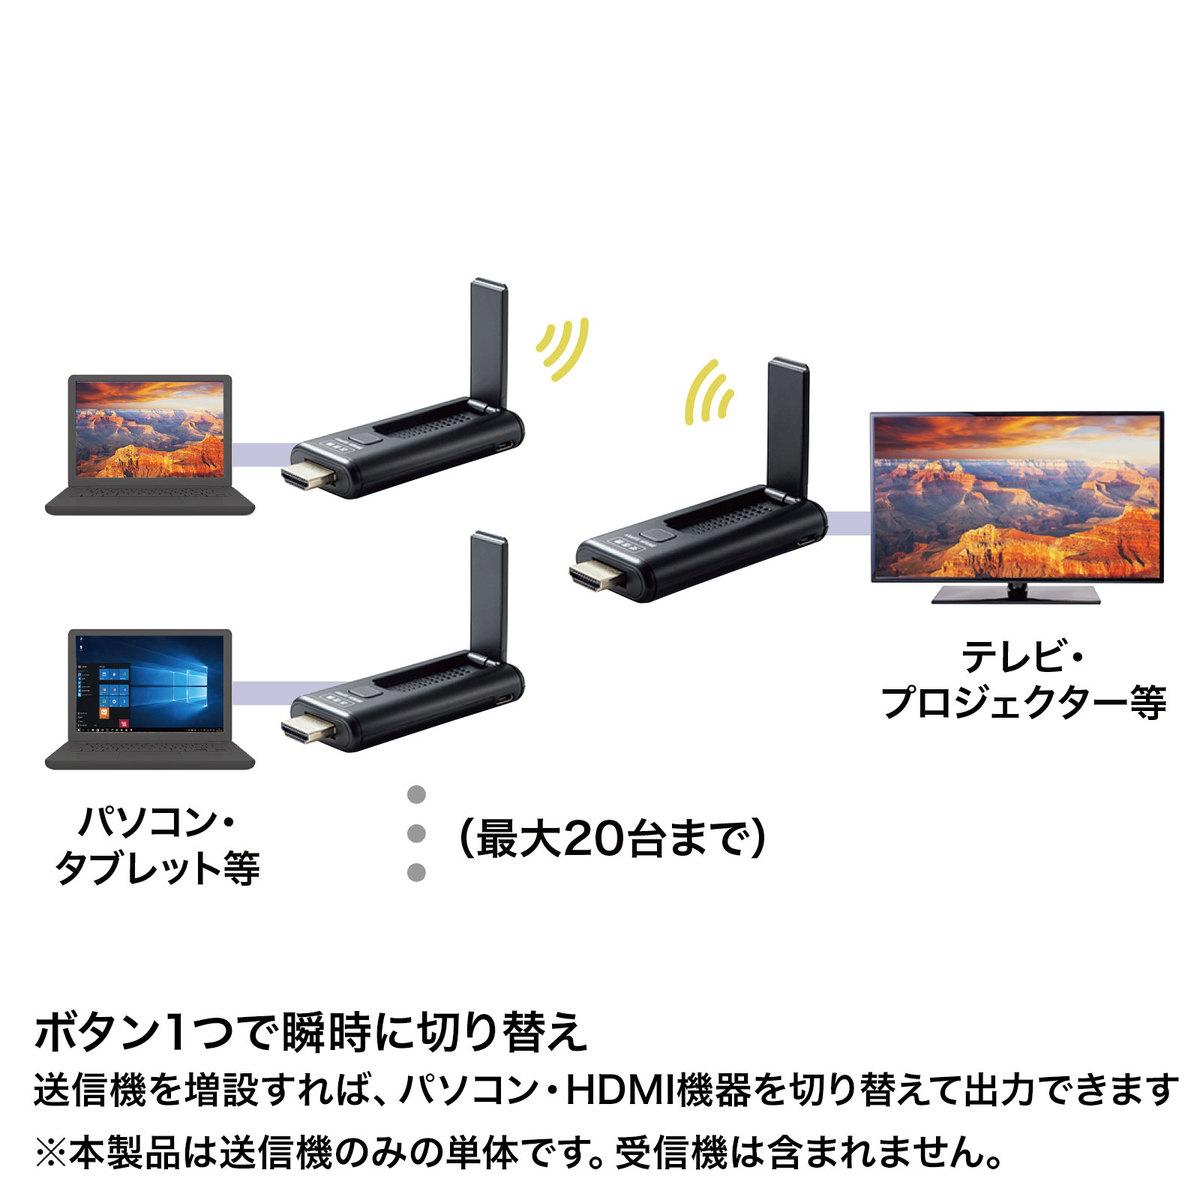 [VGA-EXWHD9TX] ワイヤレスHDMIエクステンダー(送信機のみ)